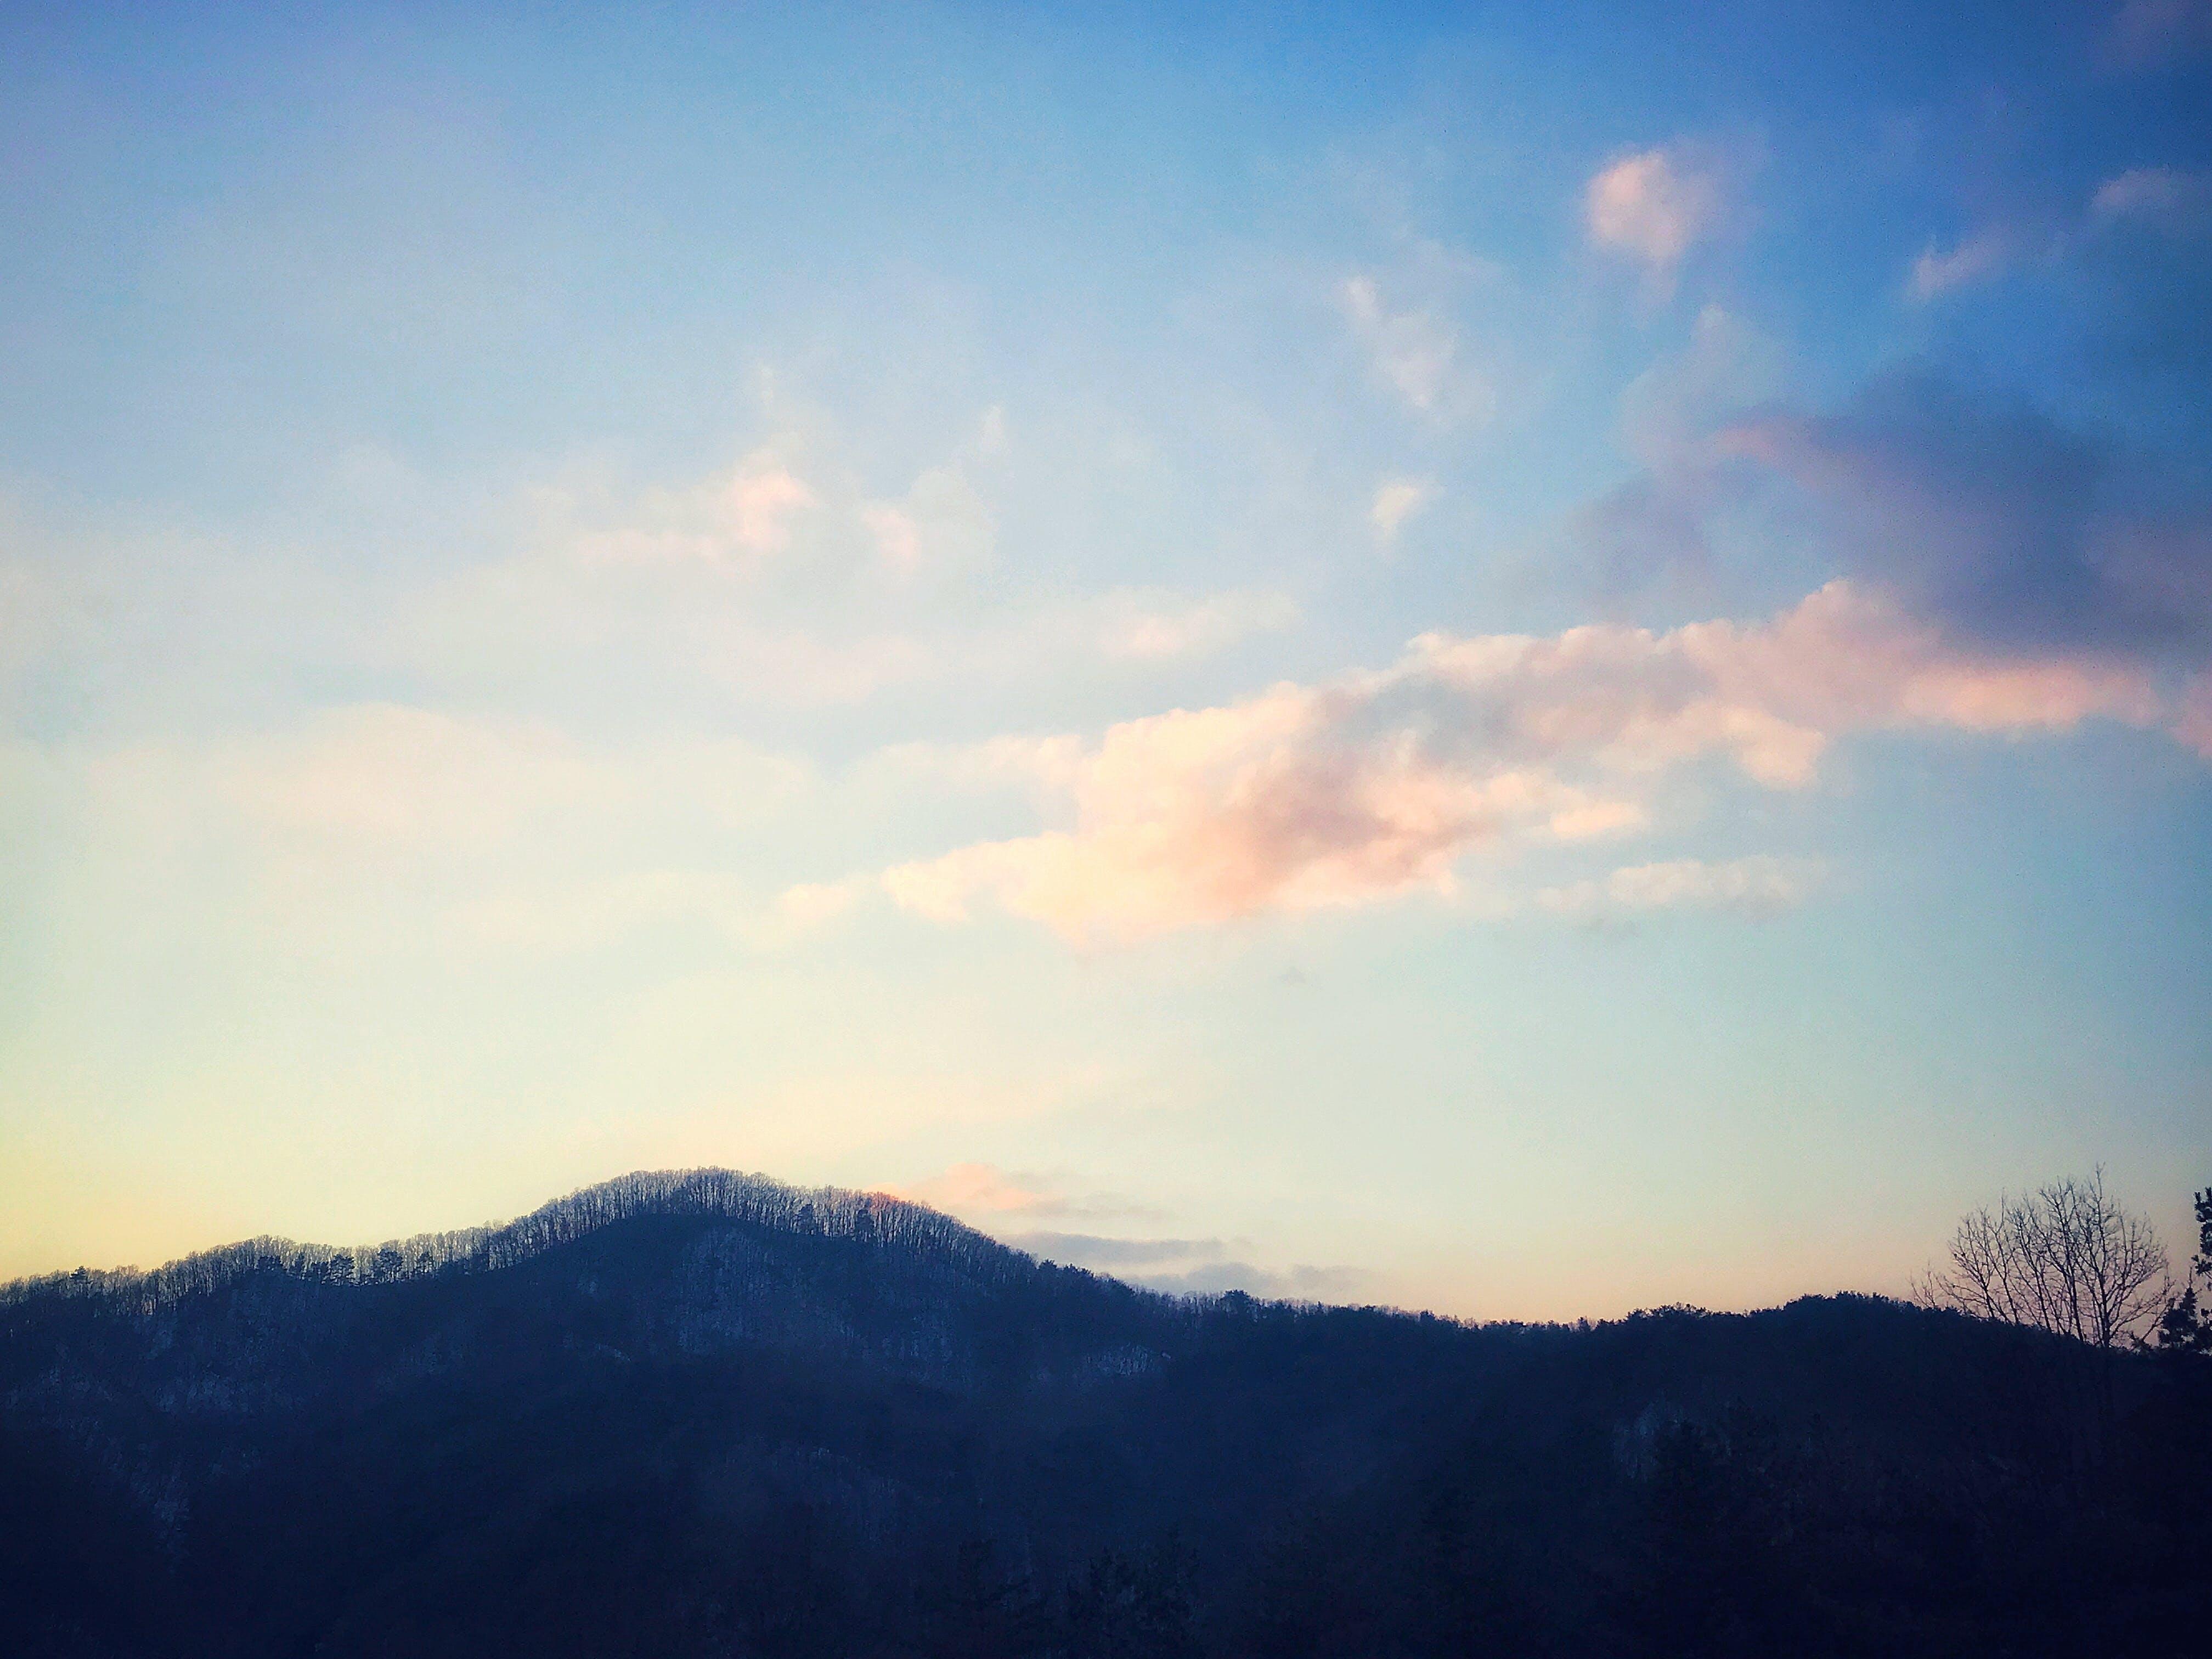 cloudy sky, mountain, sky